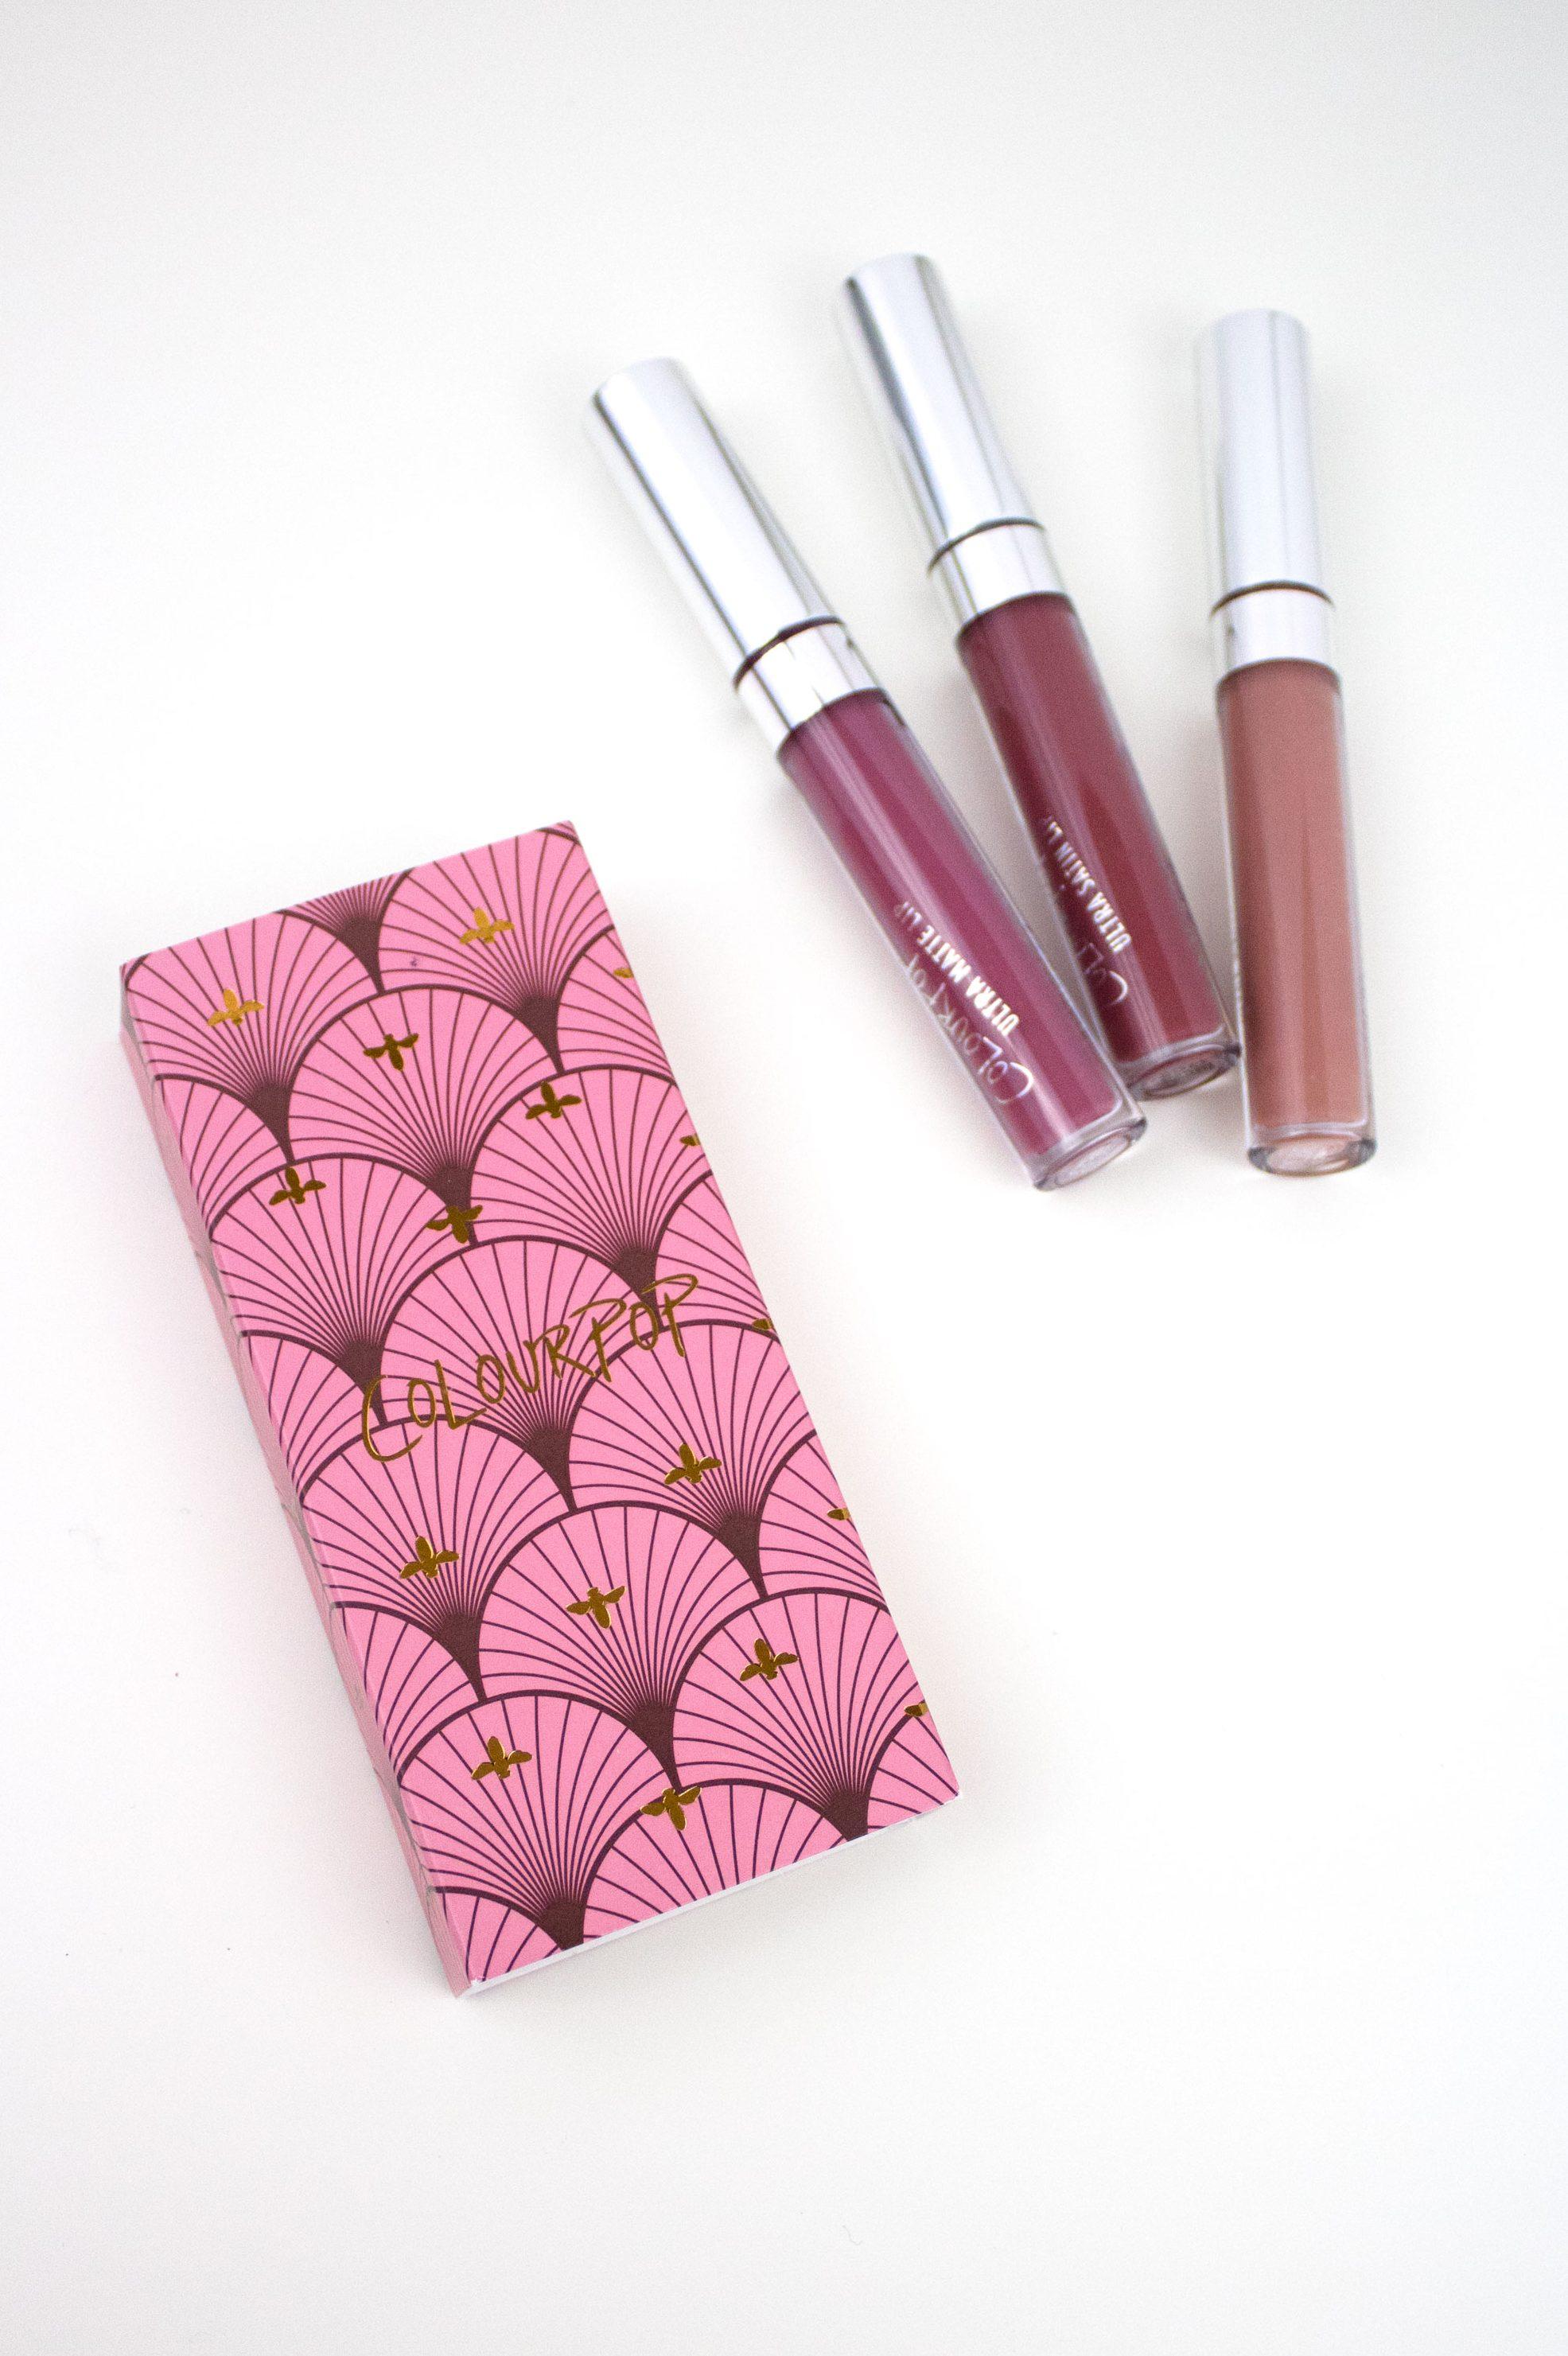 Colourpop out and about lip bundle